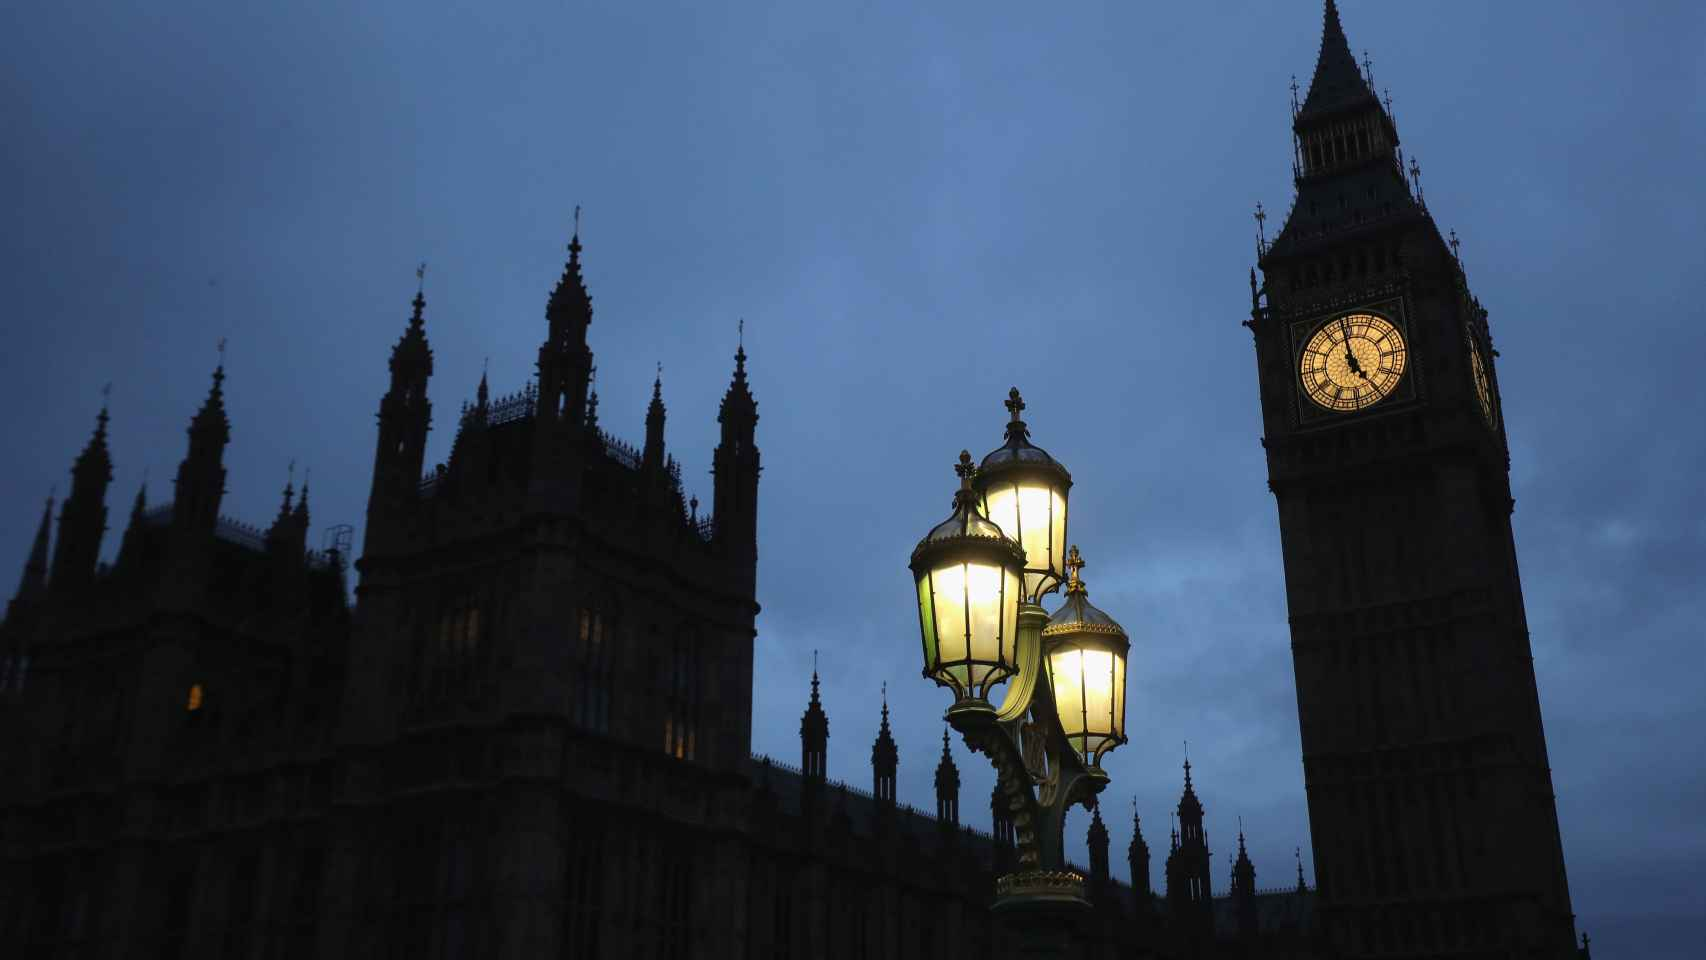 Anochecer en Londres